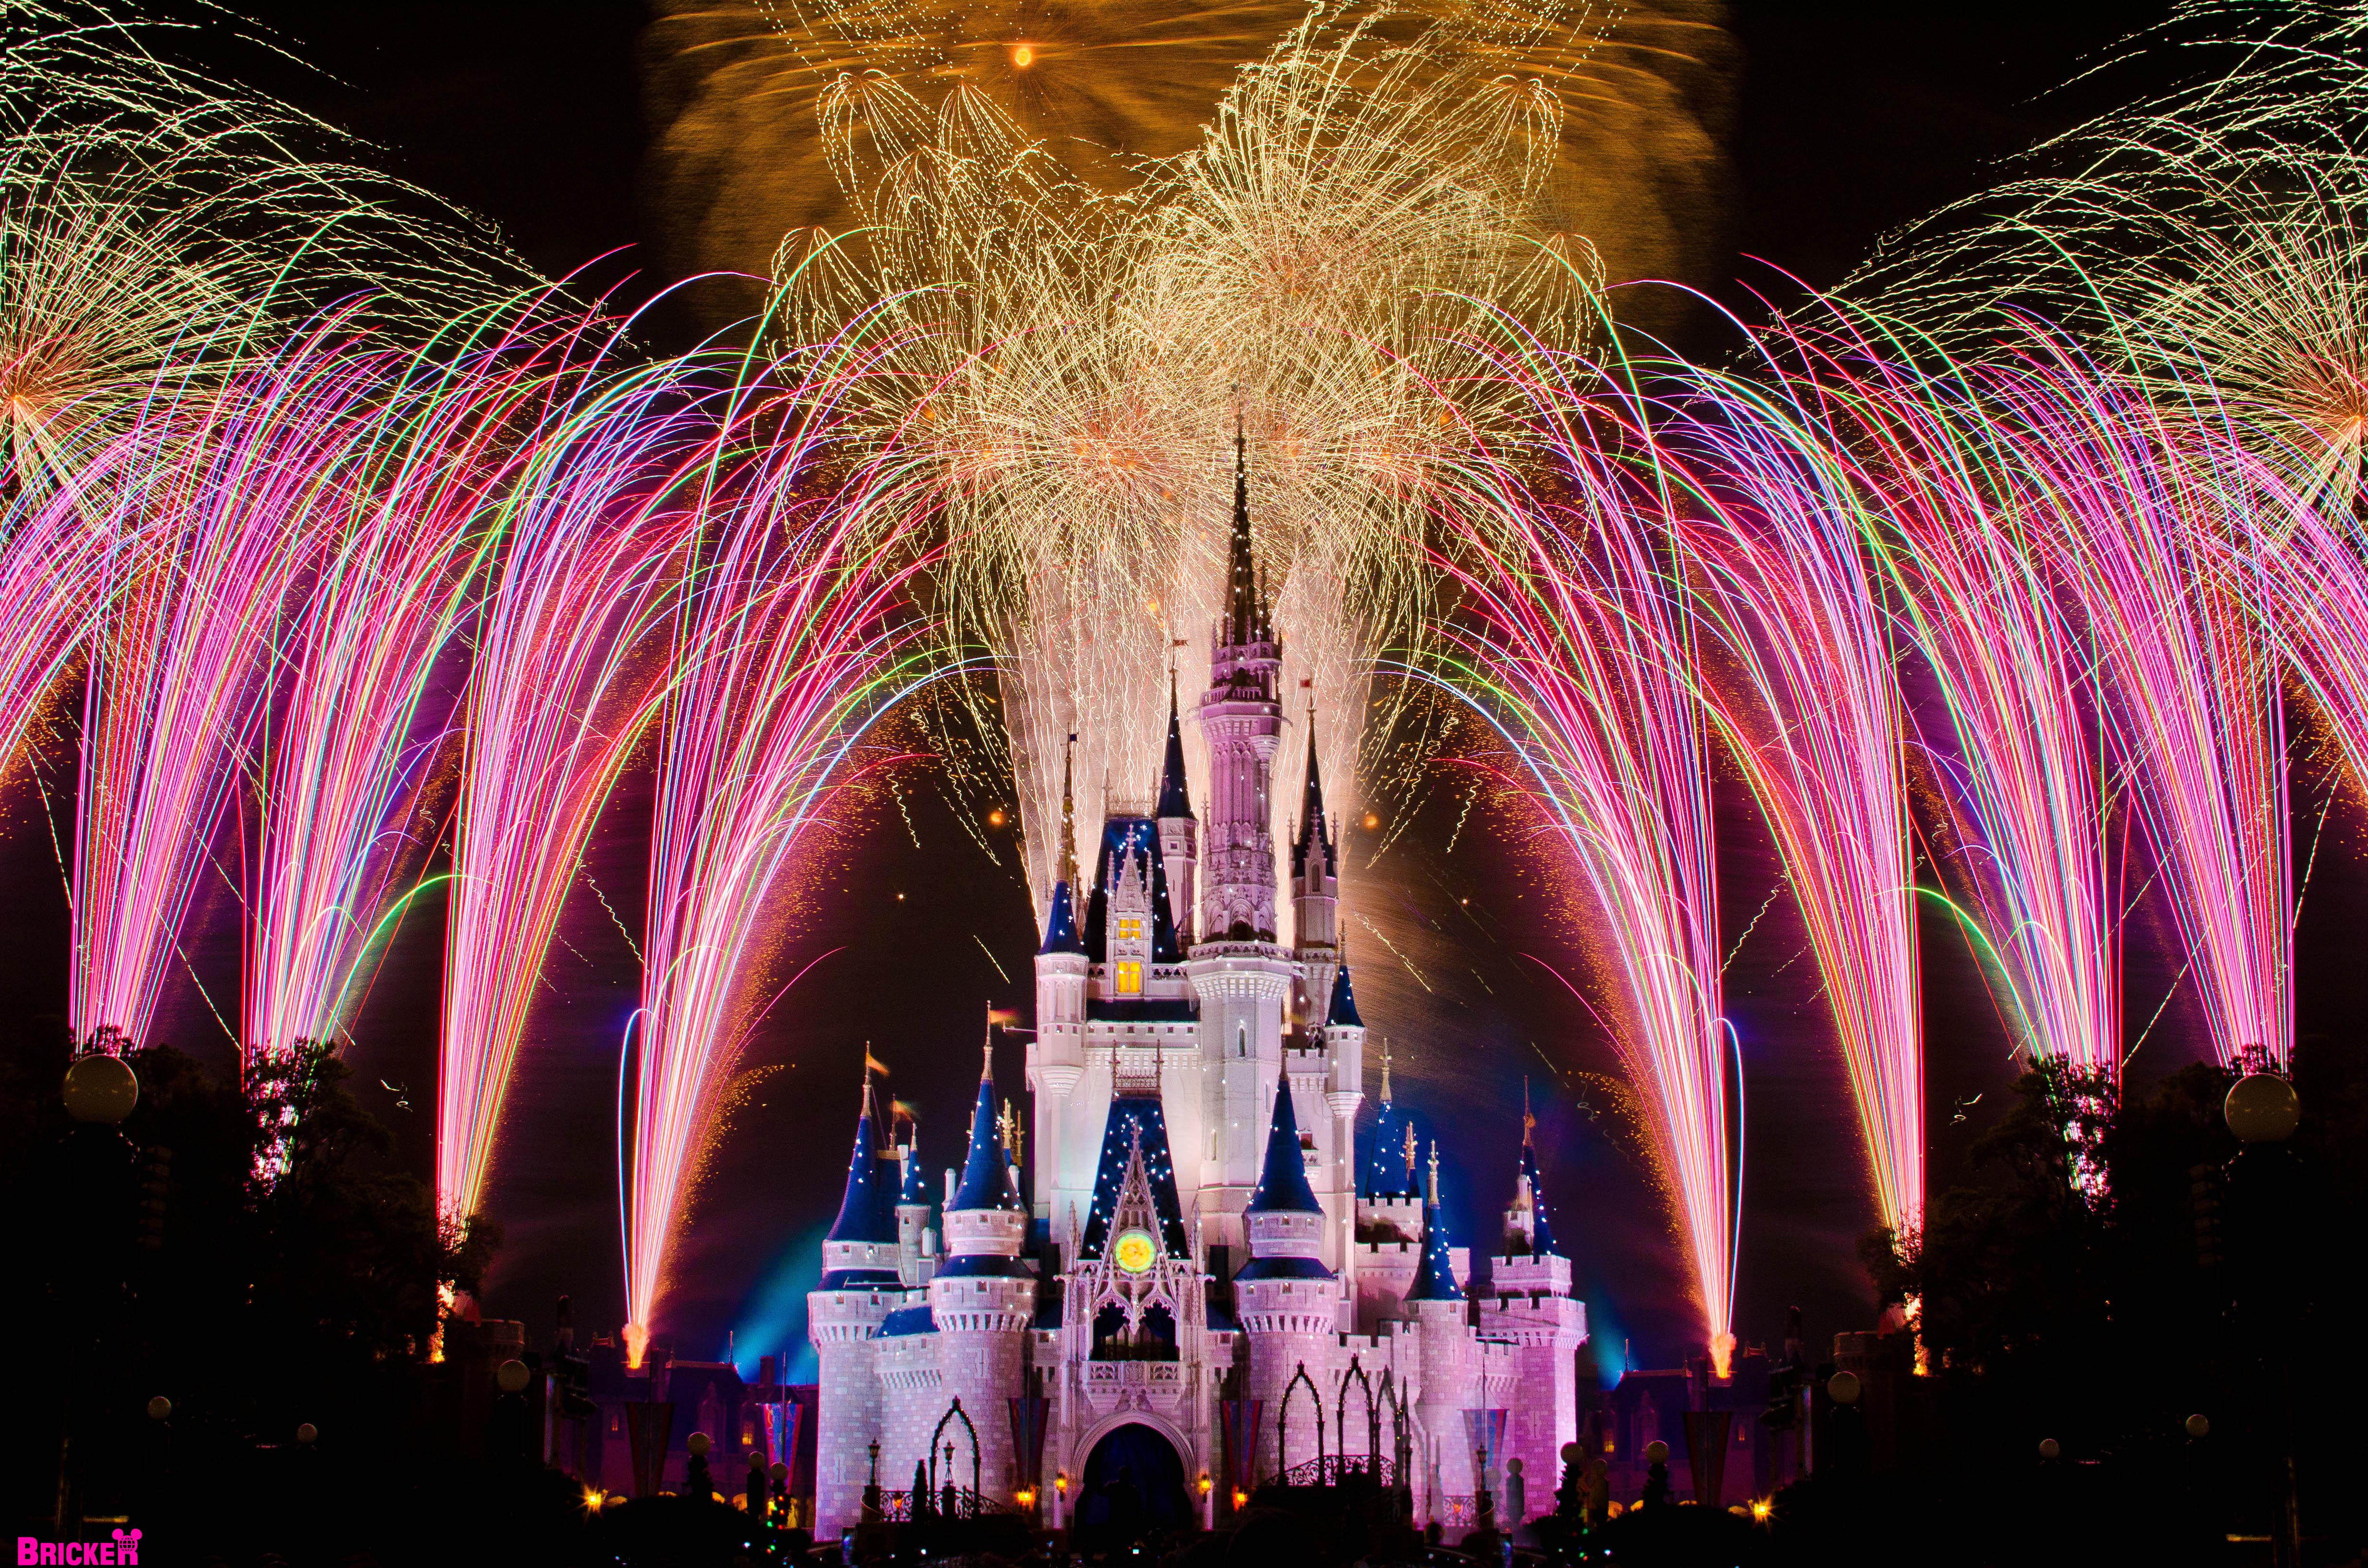 [44+] Disney World High Resolution Wallpaper on ...